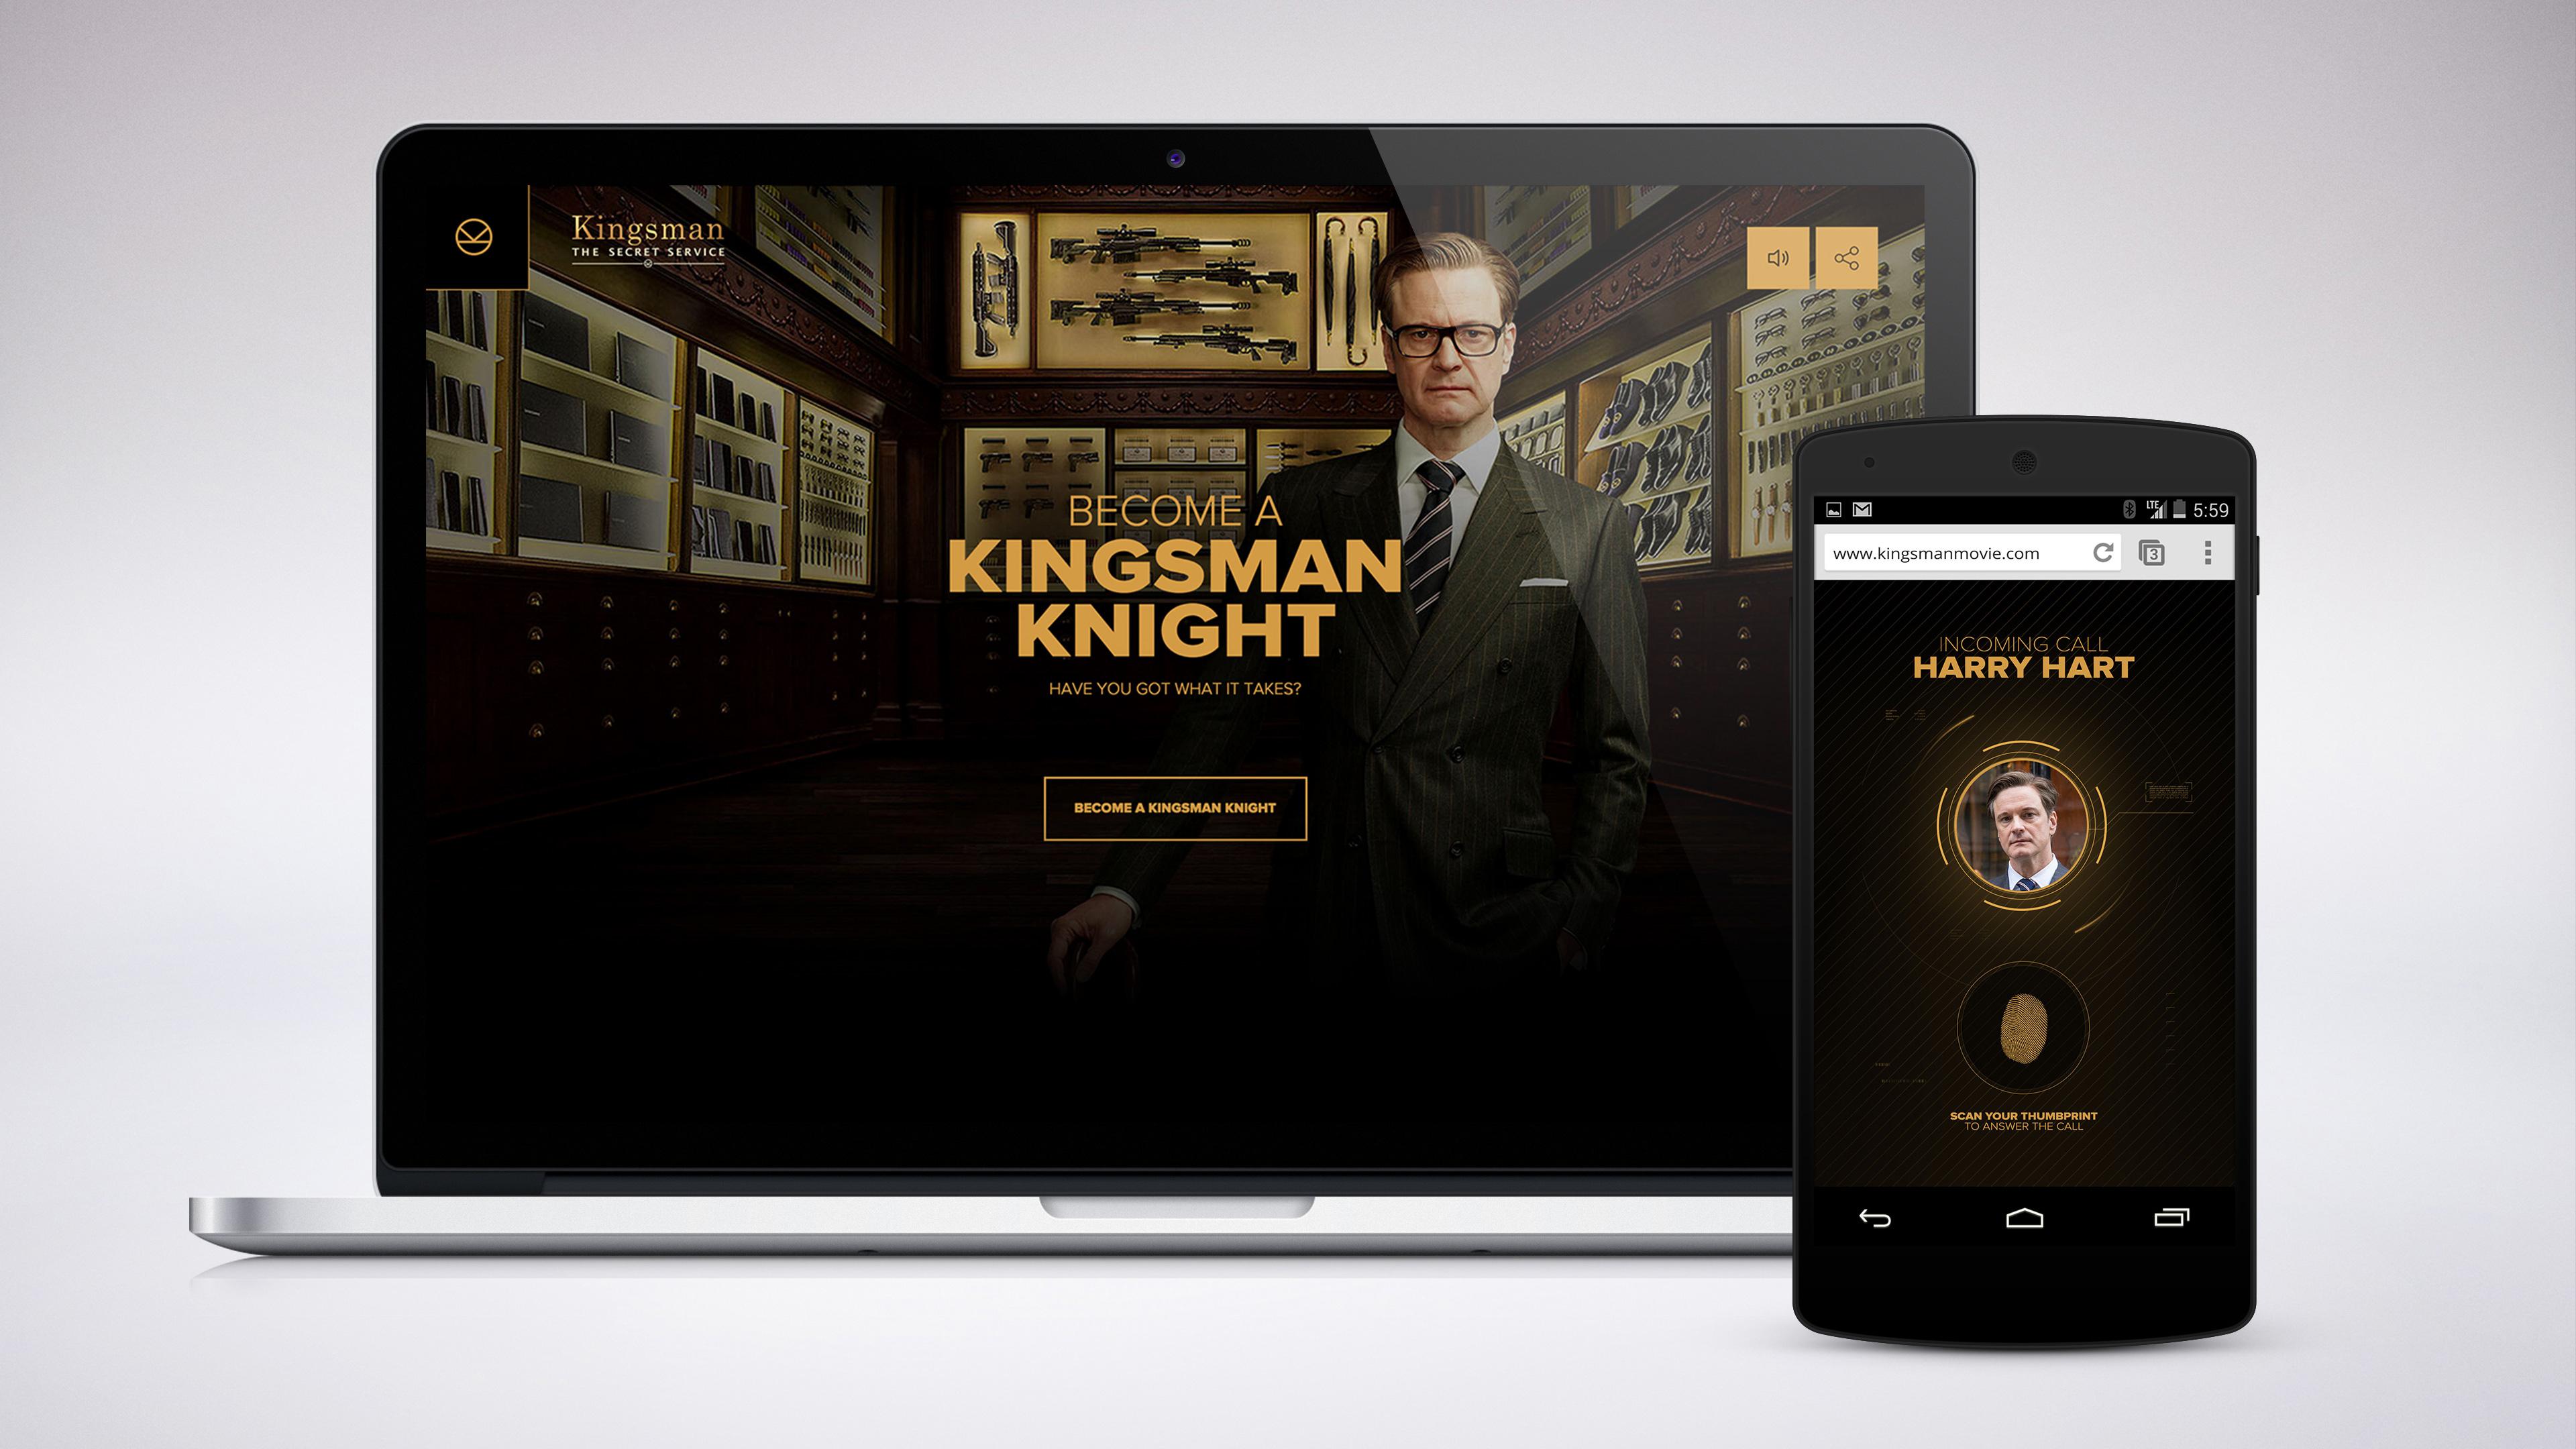 Kingsman The Secret Service The Movie Trailer Gamified Unit9